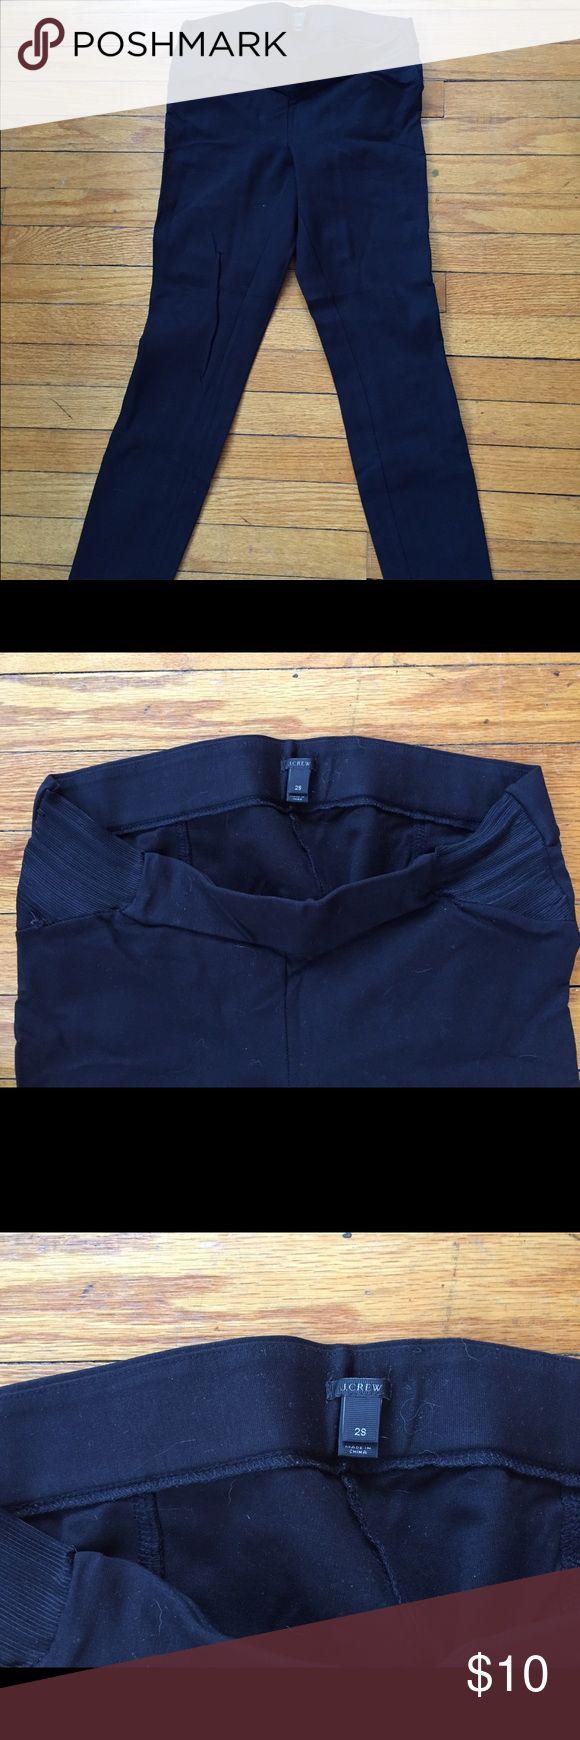 J crew maternity trousers. Size 2s. J crew maternity trousers. Size 2s. Worn a lot but still some life left. Black. J. Crew Pants Leggings